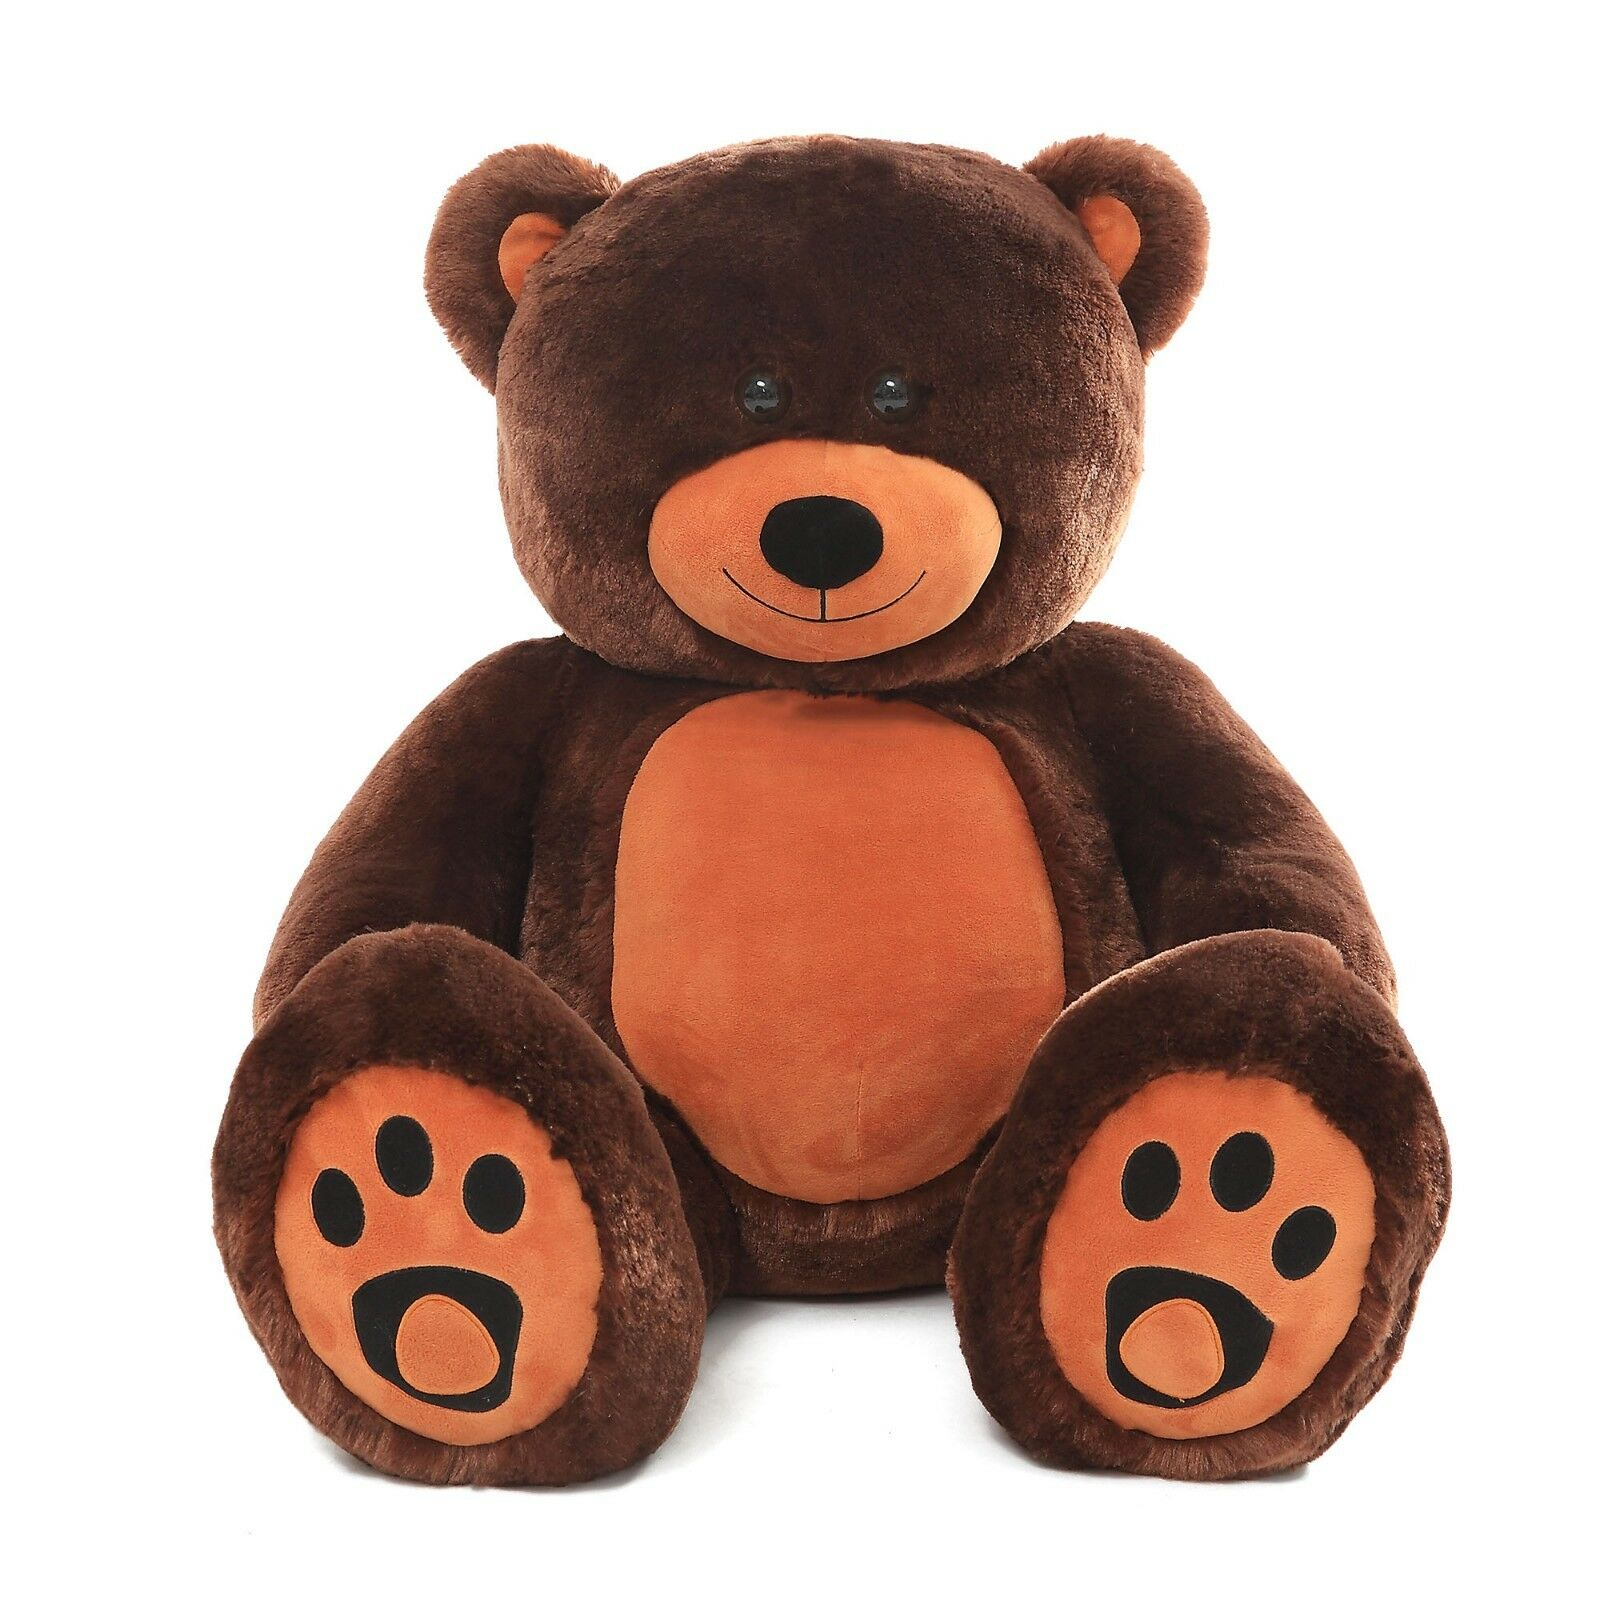 Huge Teddy Bear 6ft Soft Stuffed Plush Animal Toys 72